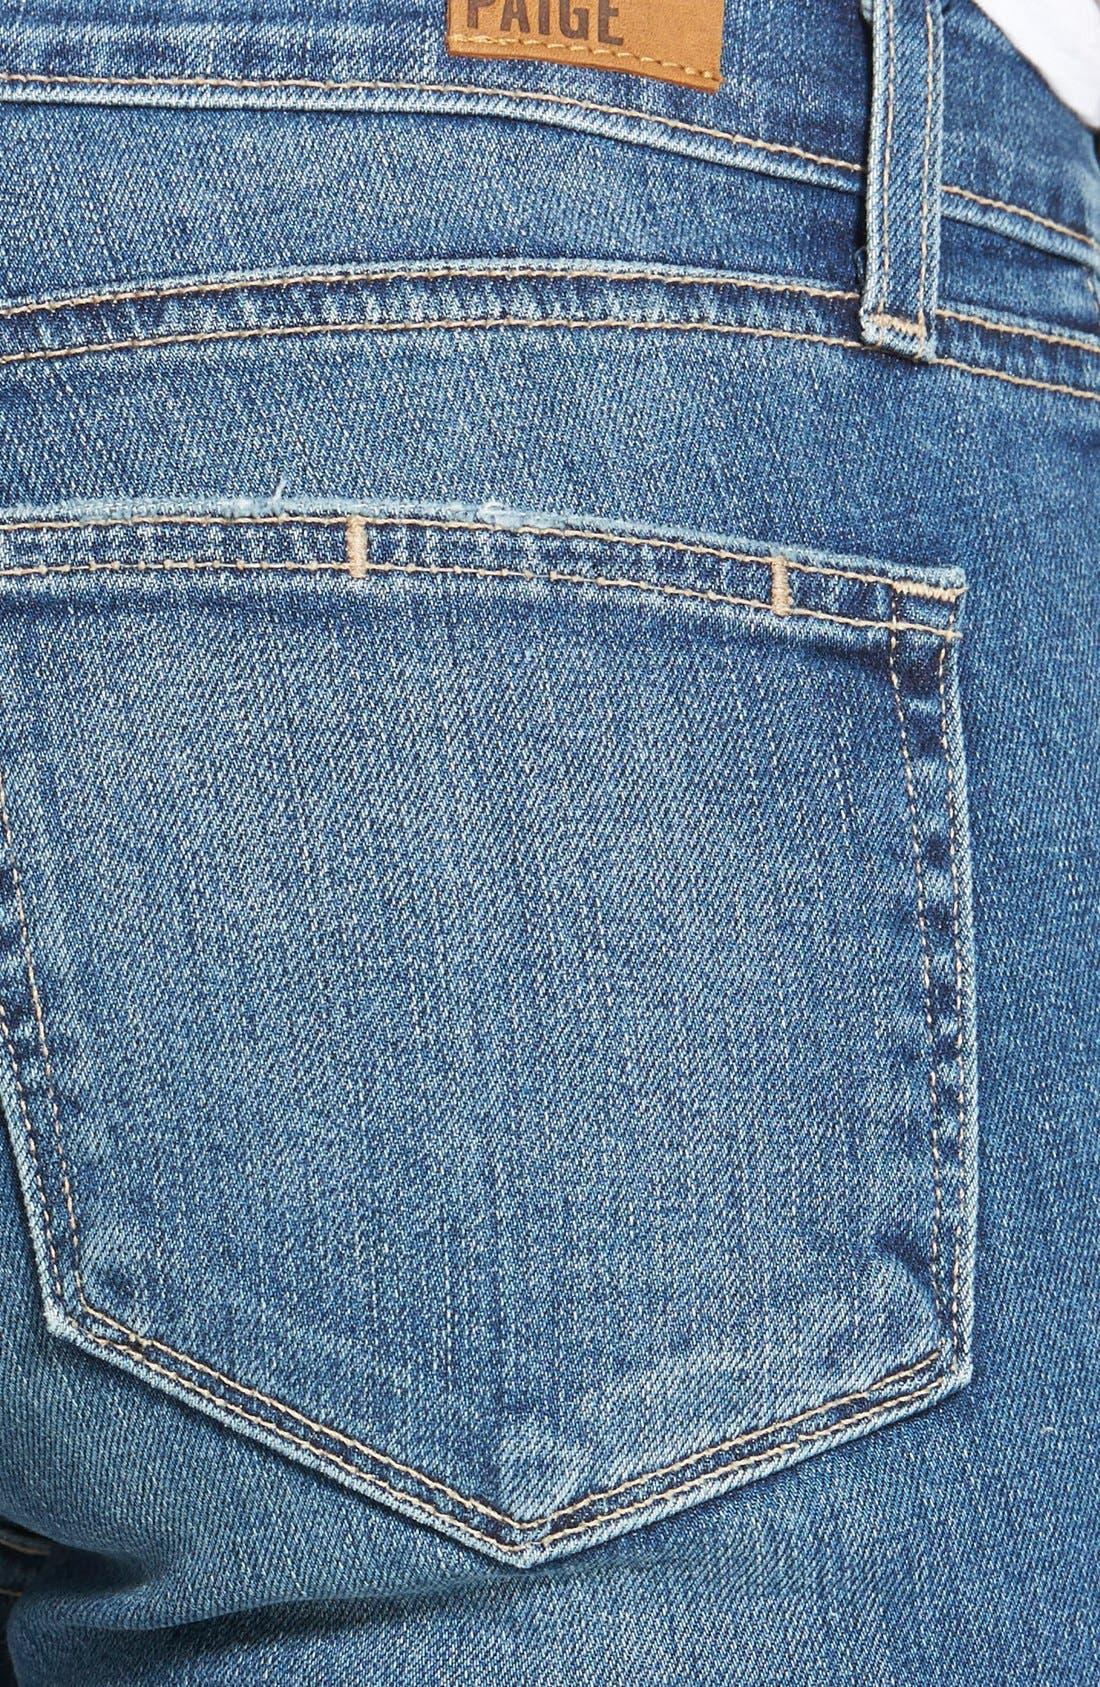 Alternate Image 3  - Paige Denim 'Verdugo' Ultra Skinny Jeans (Miles Blue)